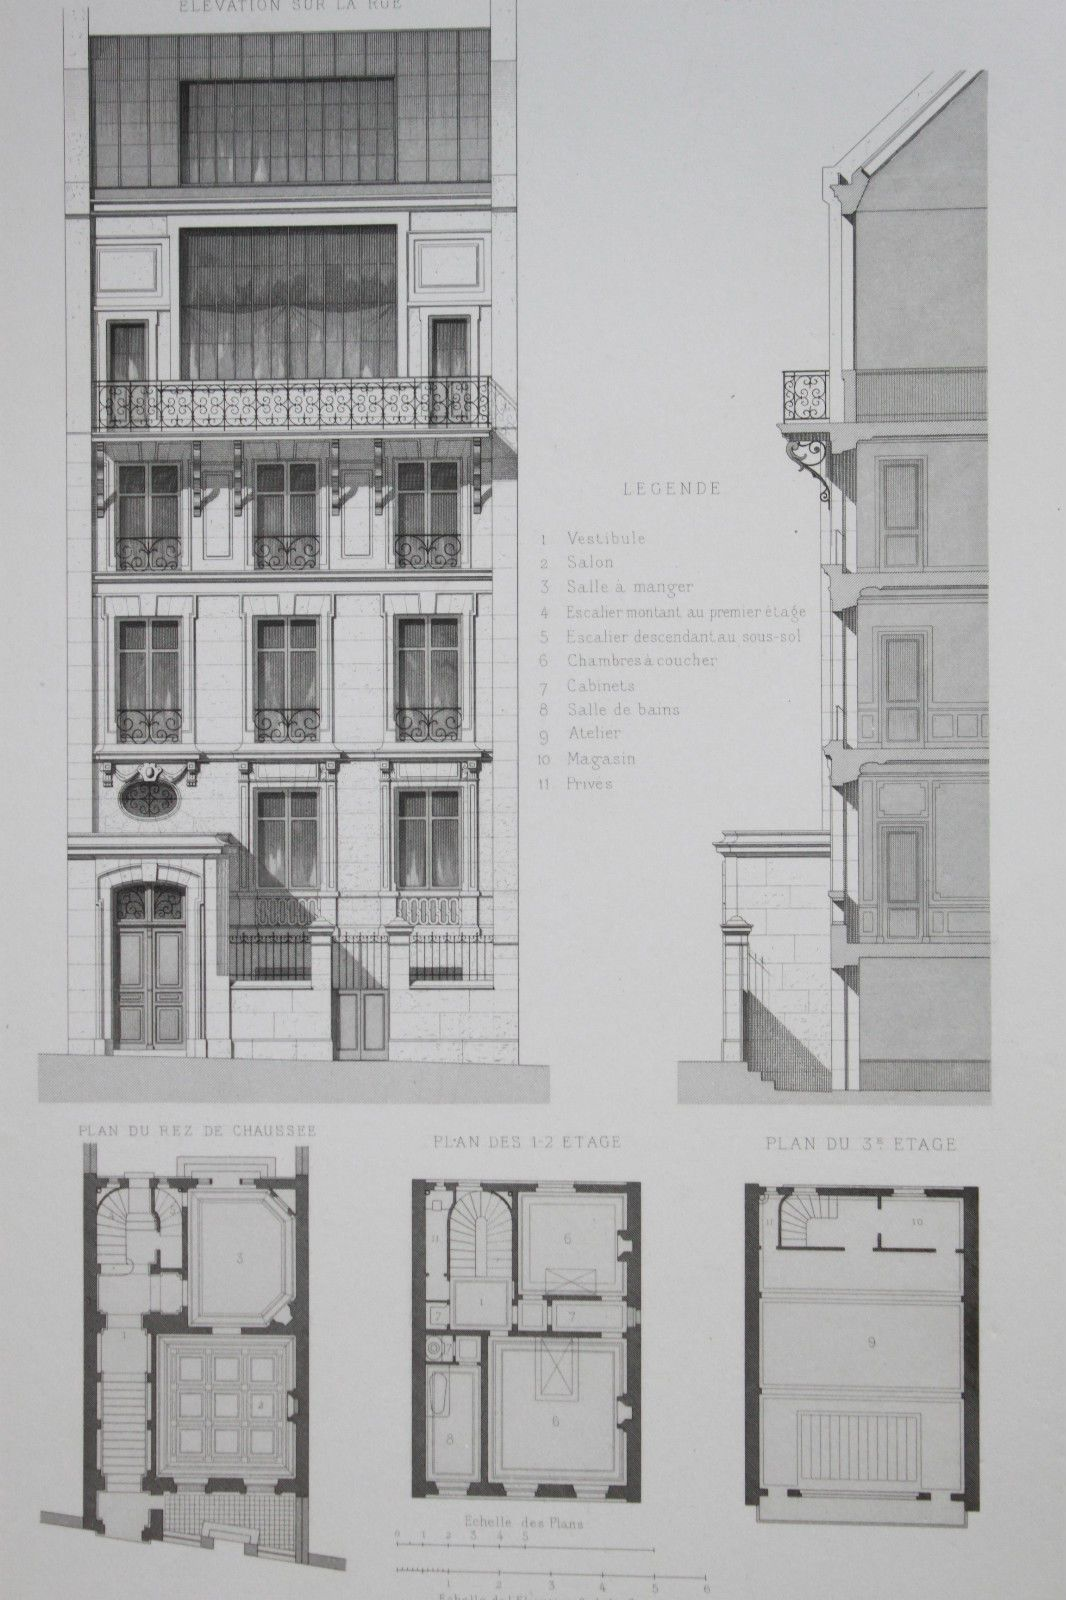 Épinglé par Тагир Тагиров sur Окна | Habitation moderne ...